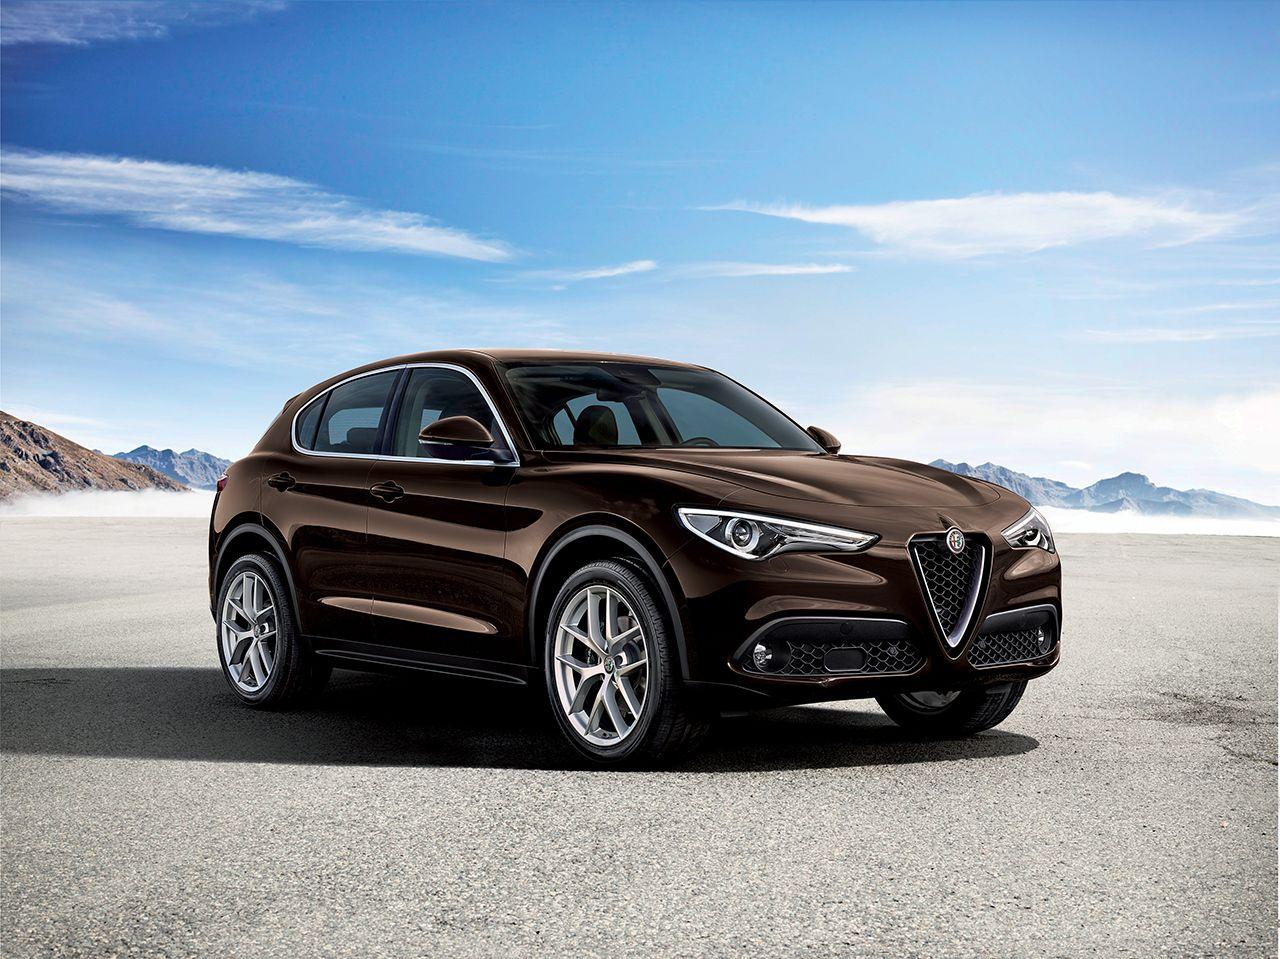 170505 Alfa Romeo Stelvio 01 Νέα έκδοση πετρελαίου 150 ίππων για την Alfa Romeo Stelvio alfa romeo, Alfa Romeo Stelvio, Alfa Romeo SUV, SUV